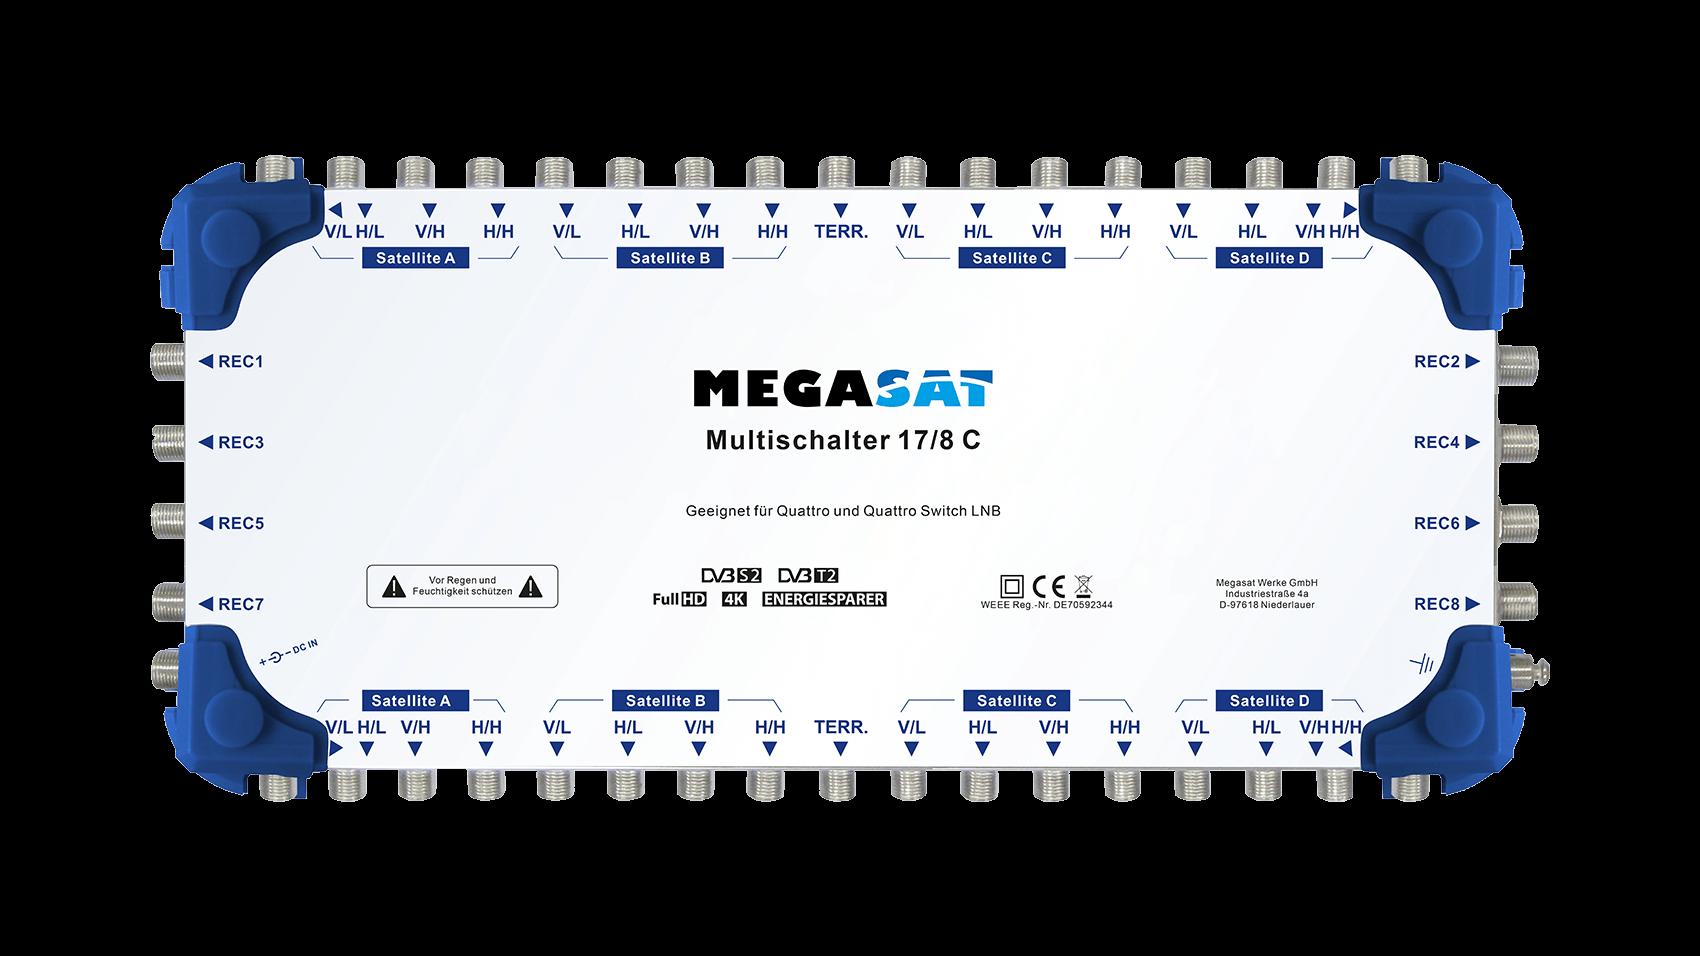 megasat_multischalter_17_8_c_frontansicht